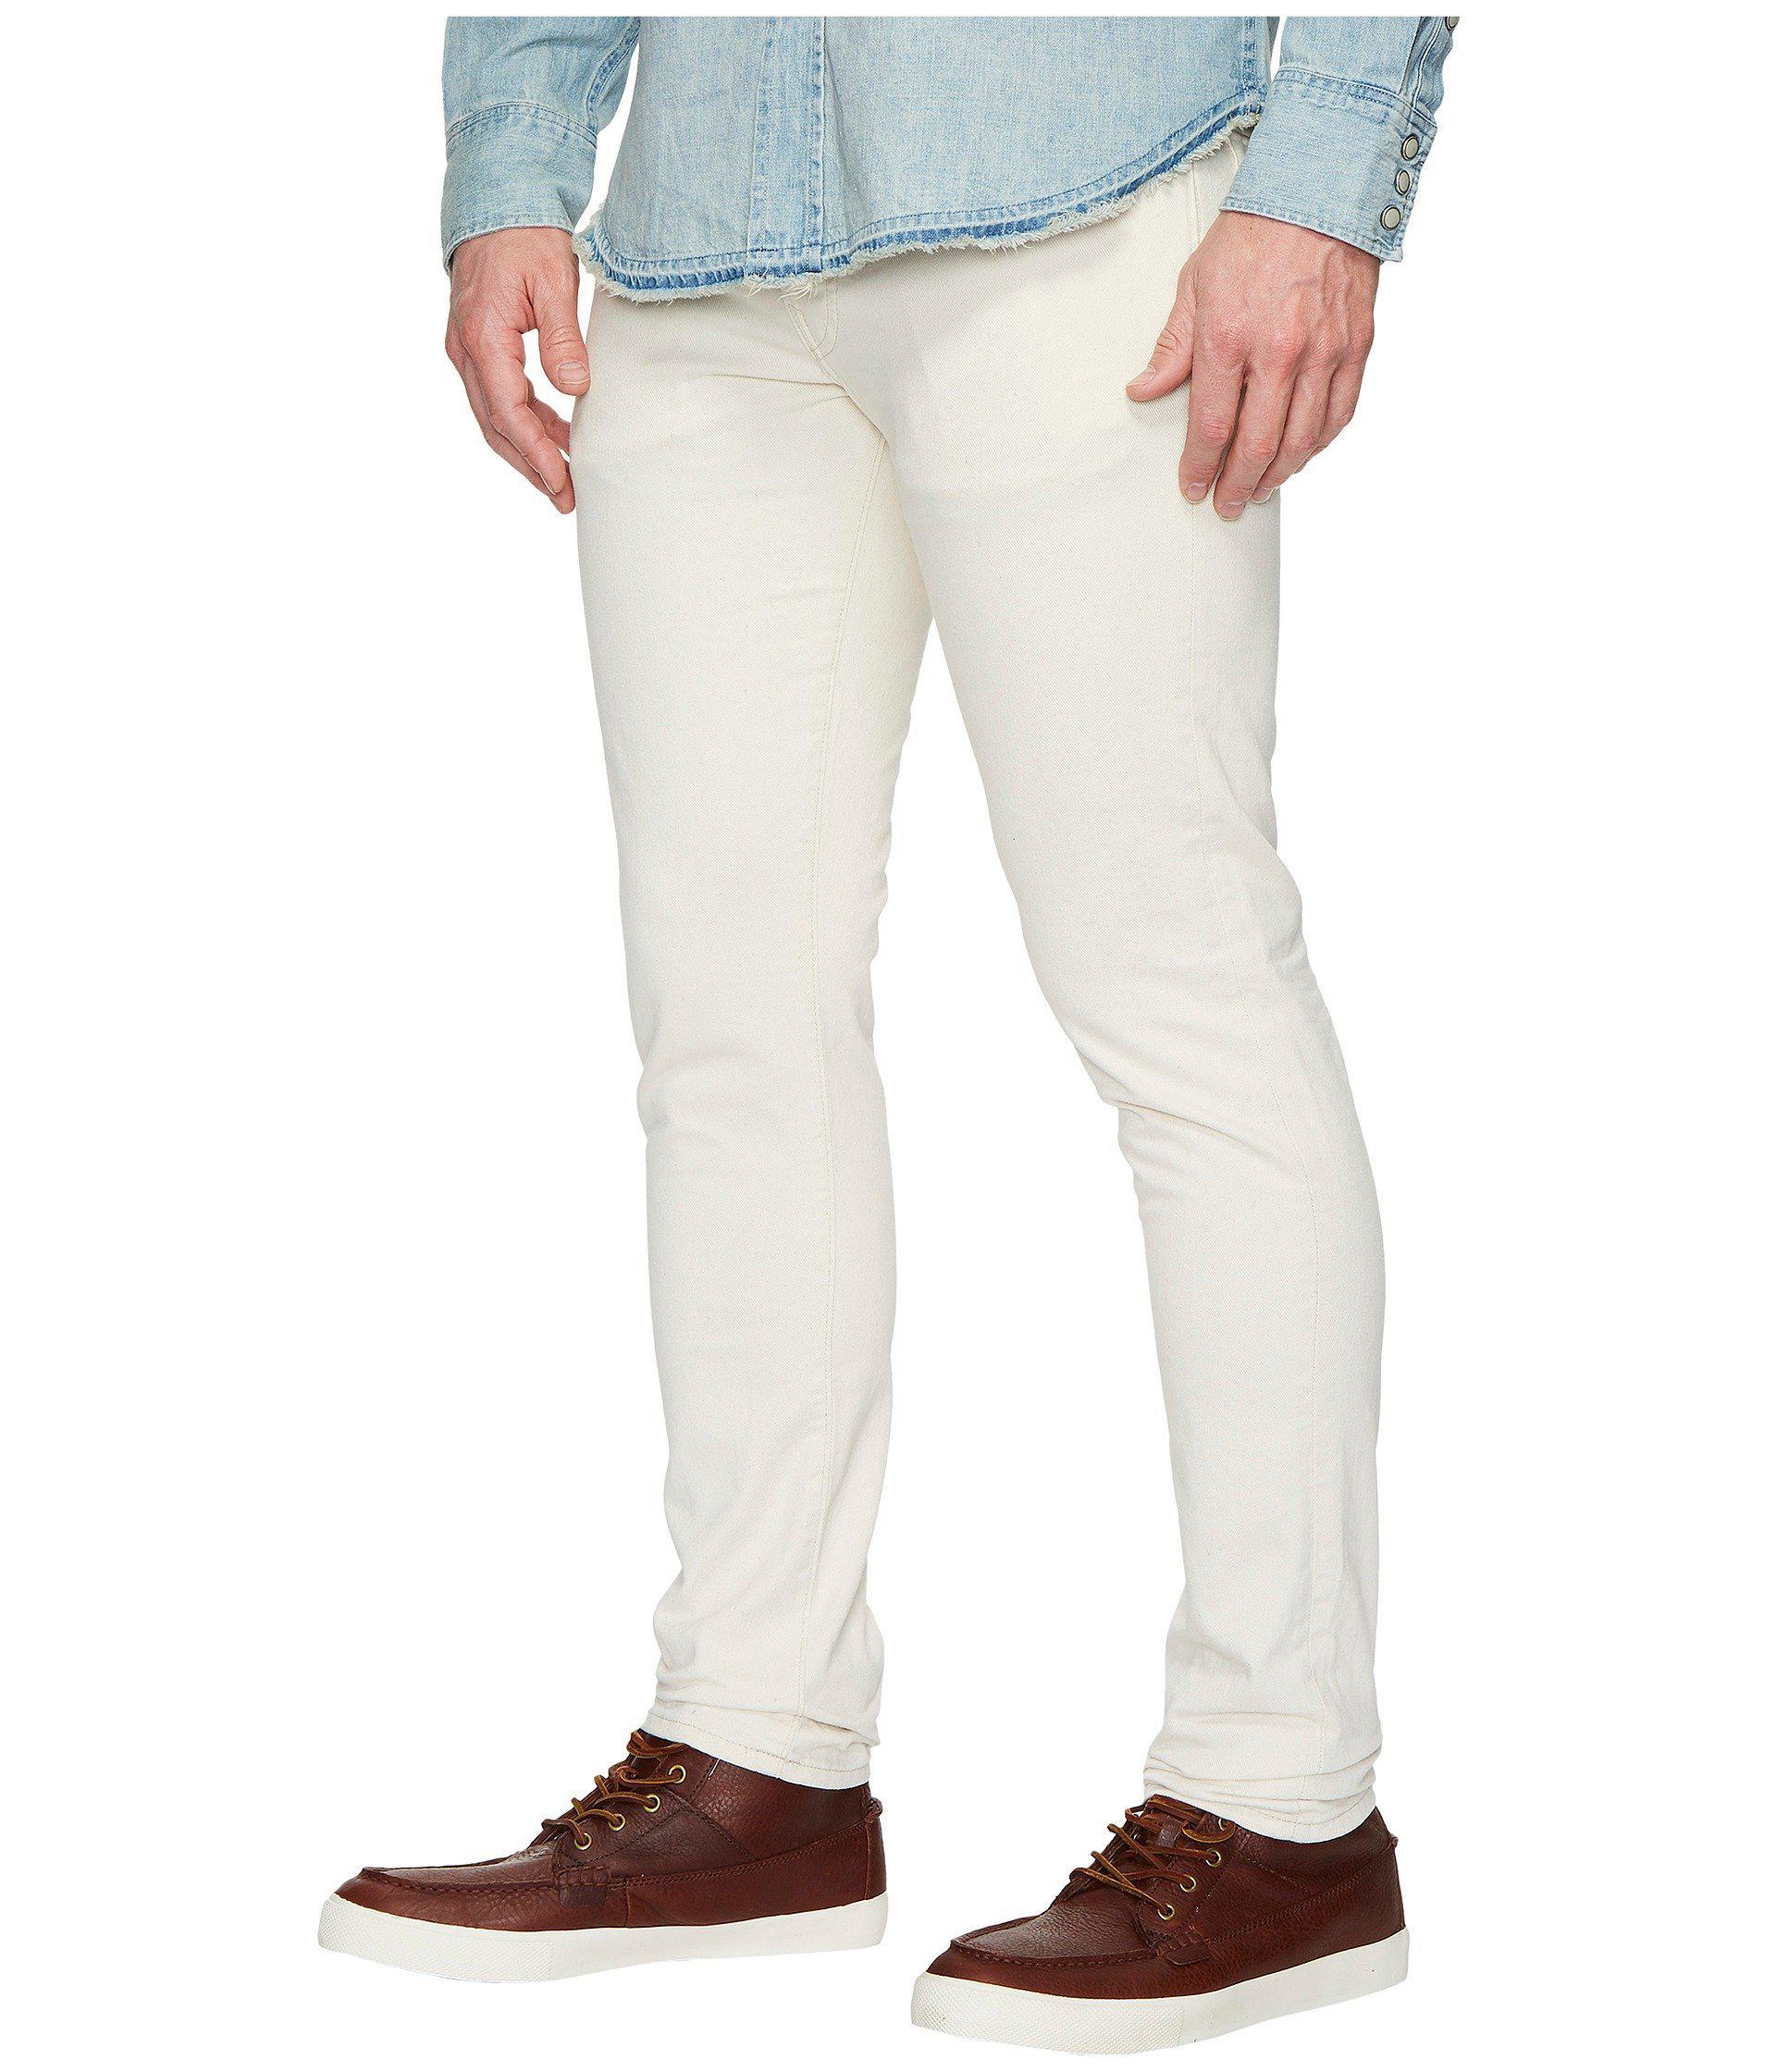 203d504baa01 Lyst - Polo Ralph Lauren Sullivan Slim Five-pocket Denim In Gardner  (gardner) Men s Jeans in Blue for Men - Save 50%